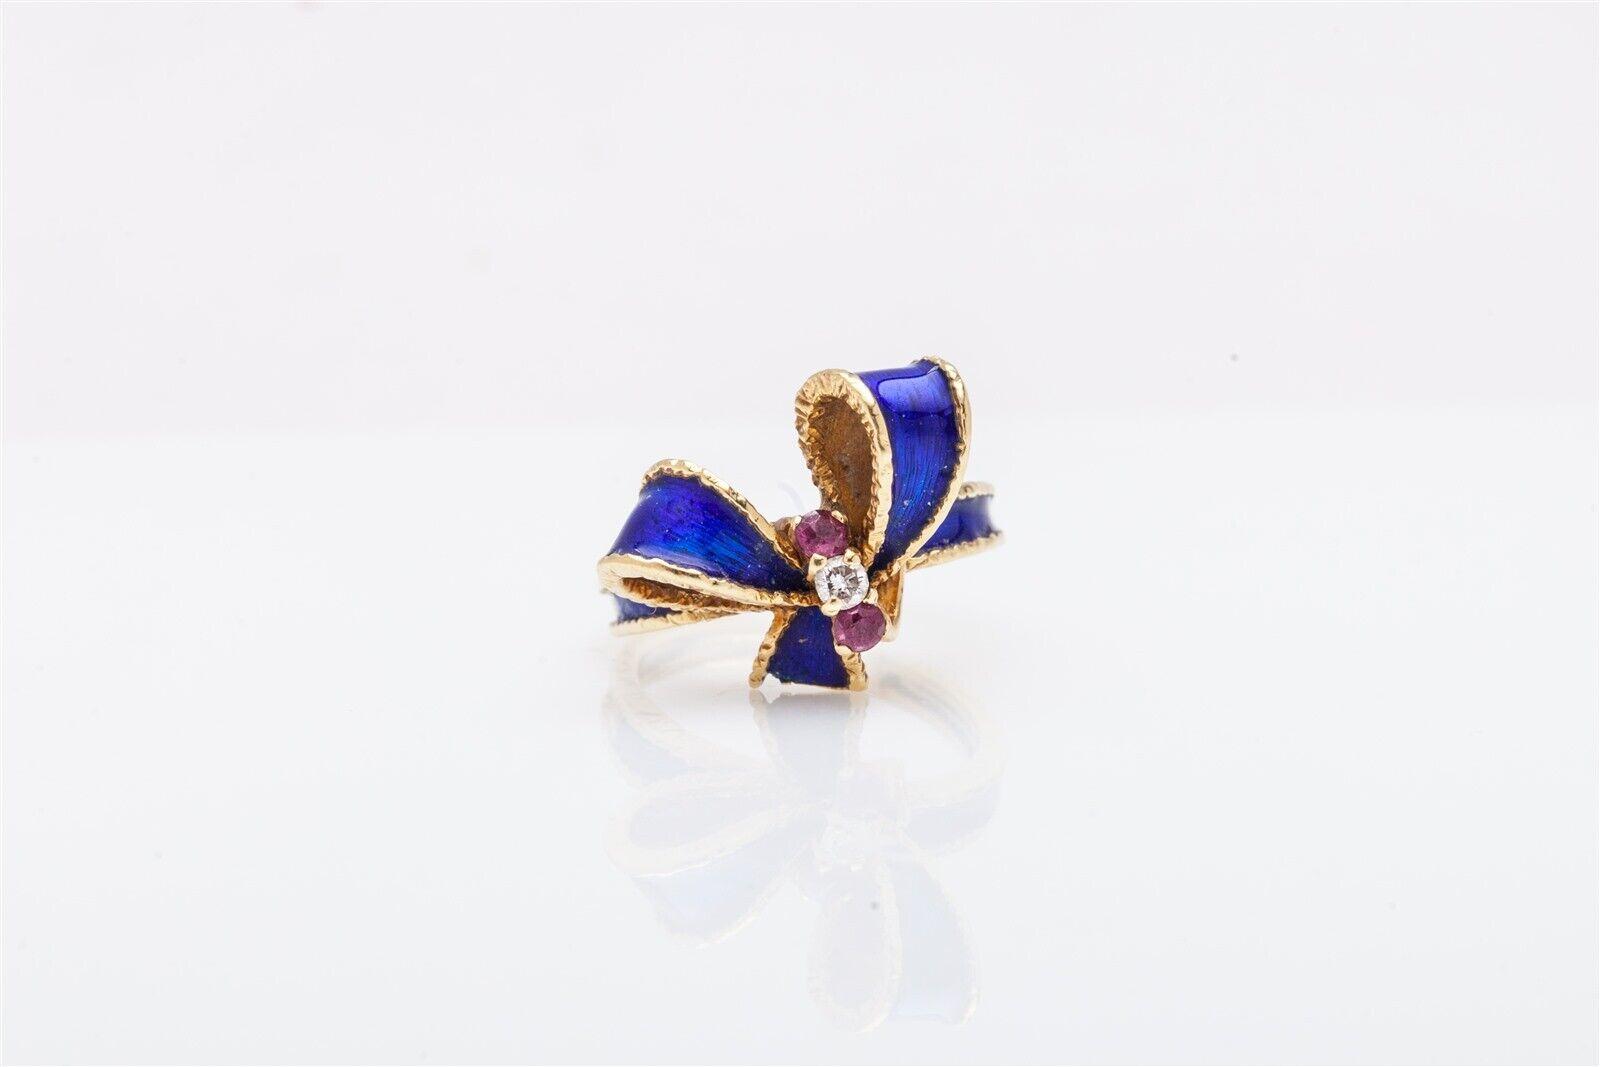 Antique RUSSIAN bluee Cobalt Enamel Ruby Diamond 1940s RETRO BOW TIE Ring 6g